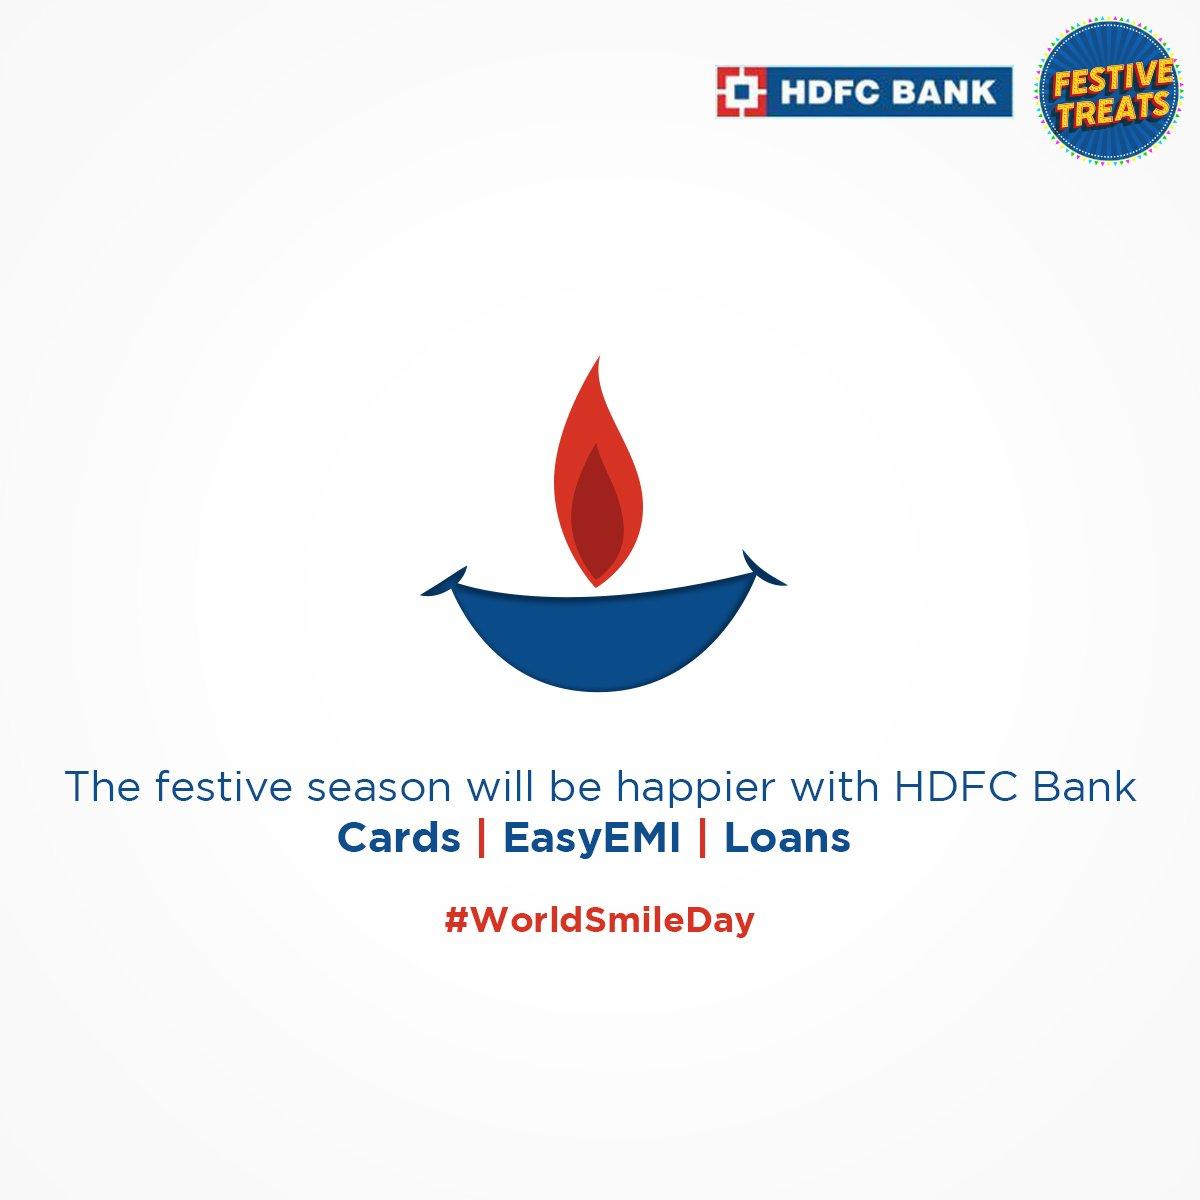 Hdfc Bank Branch In Parliament Street New Delhi 110001